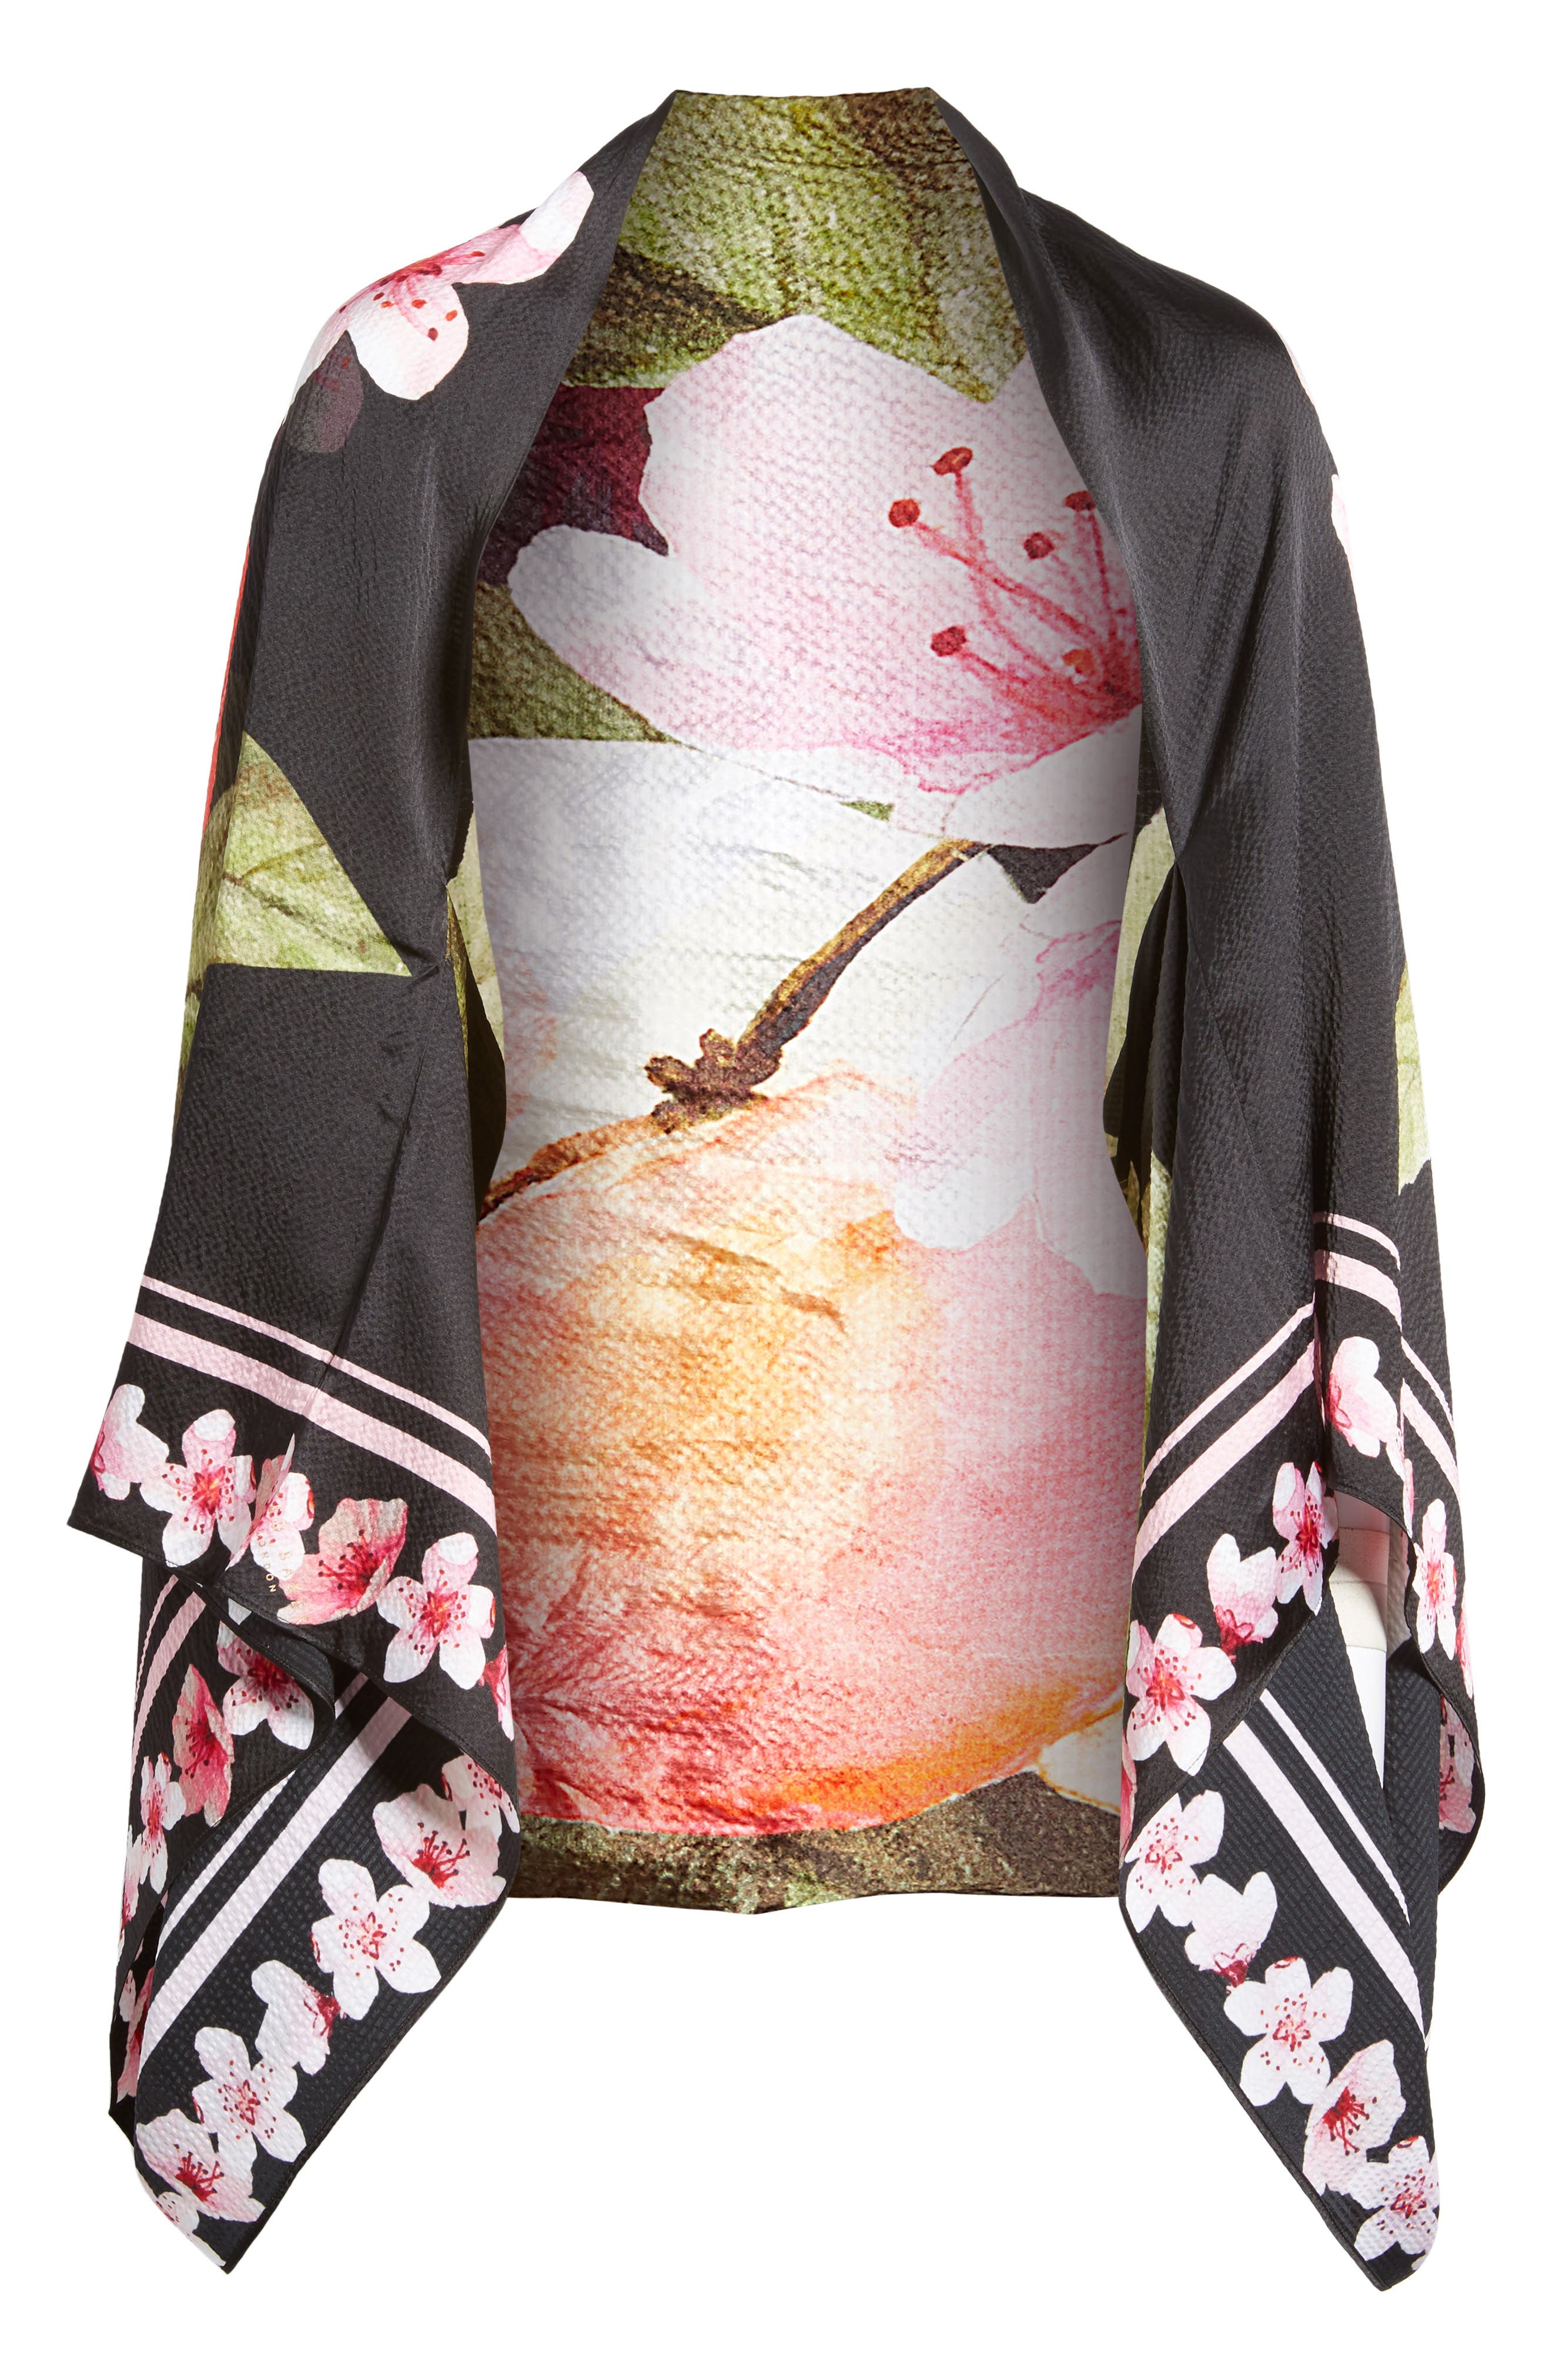 Peach Blossom Silk Cape Scarf,                             Alternate thumbnail 6, color,                             00-Black